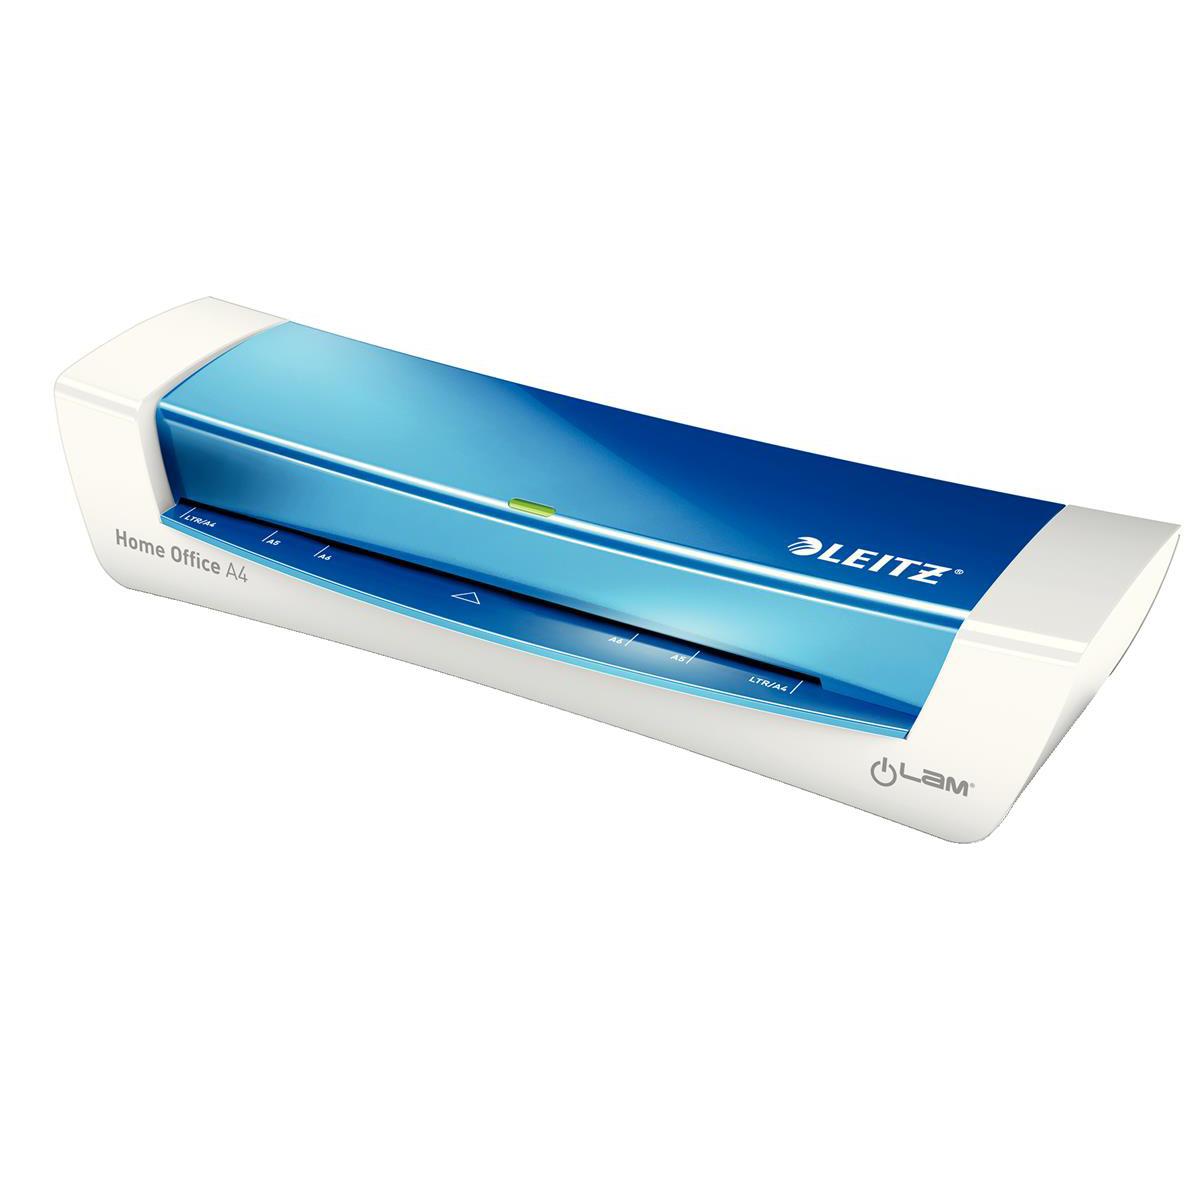 Leitz iLam HomeOffice Laminator A4 Blue Ref 73681036